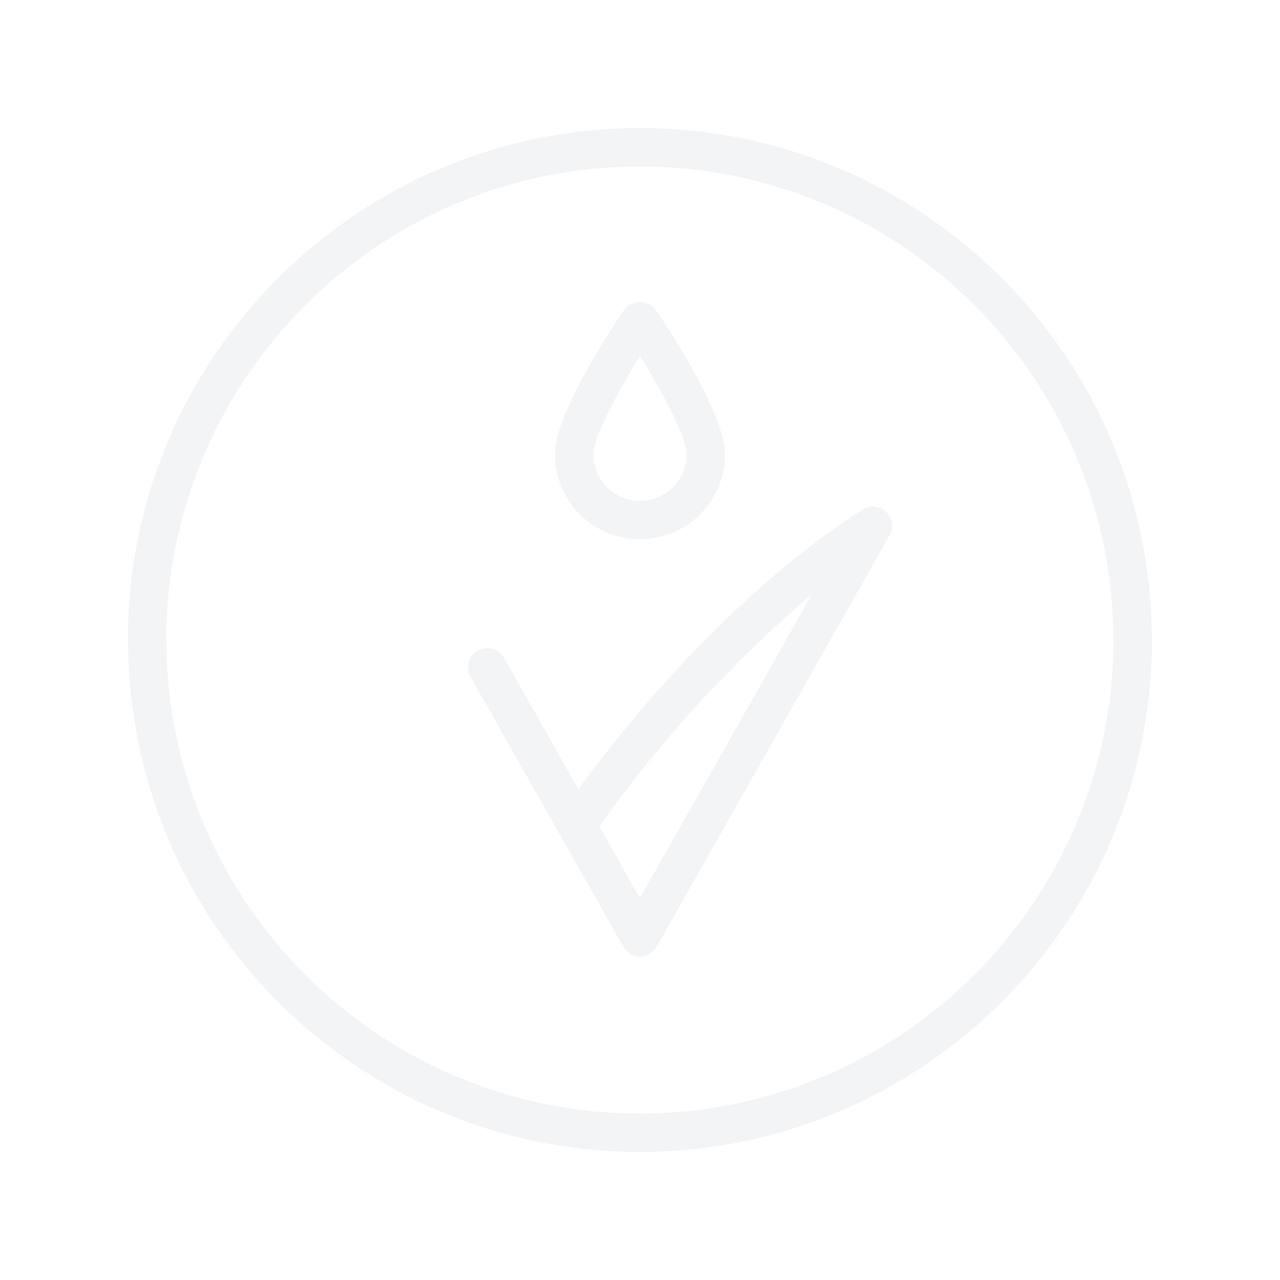 LUUV Natural Self Tanning Oil Light 100ml